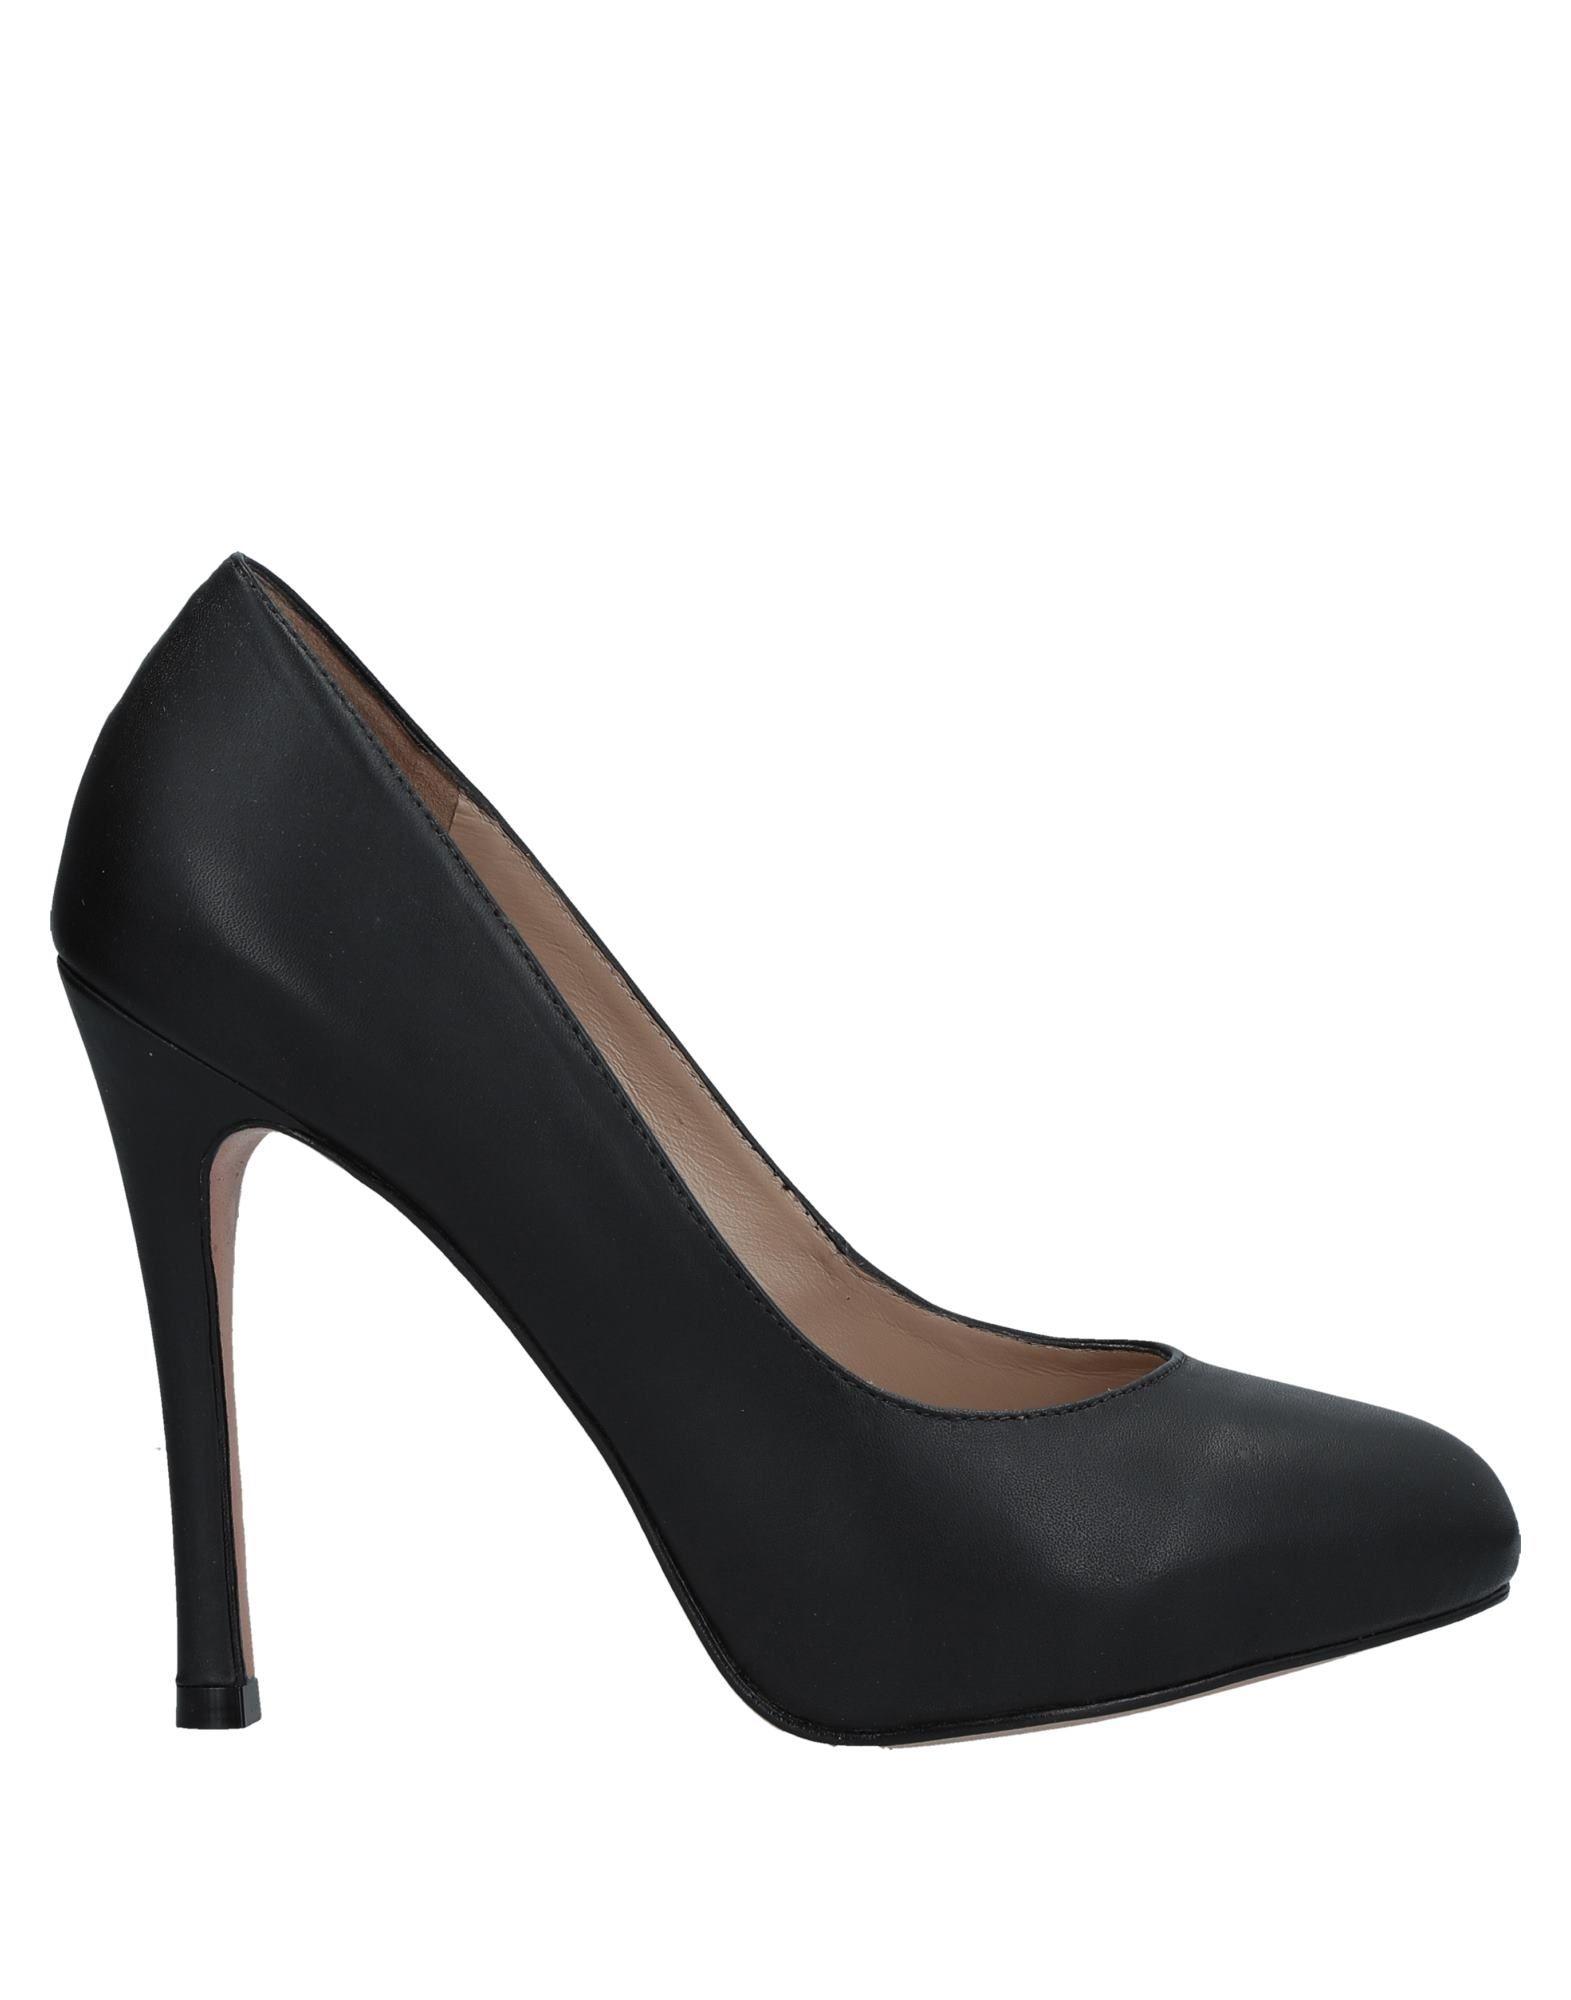 Gut um billige Damen Schuhe zu tragenPrimafila Pumps Damen billige  11505461OG 8f7603